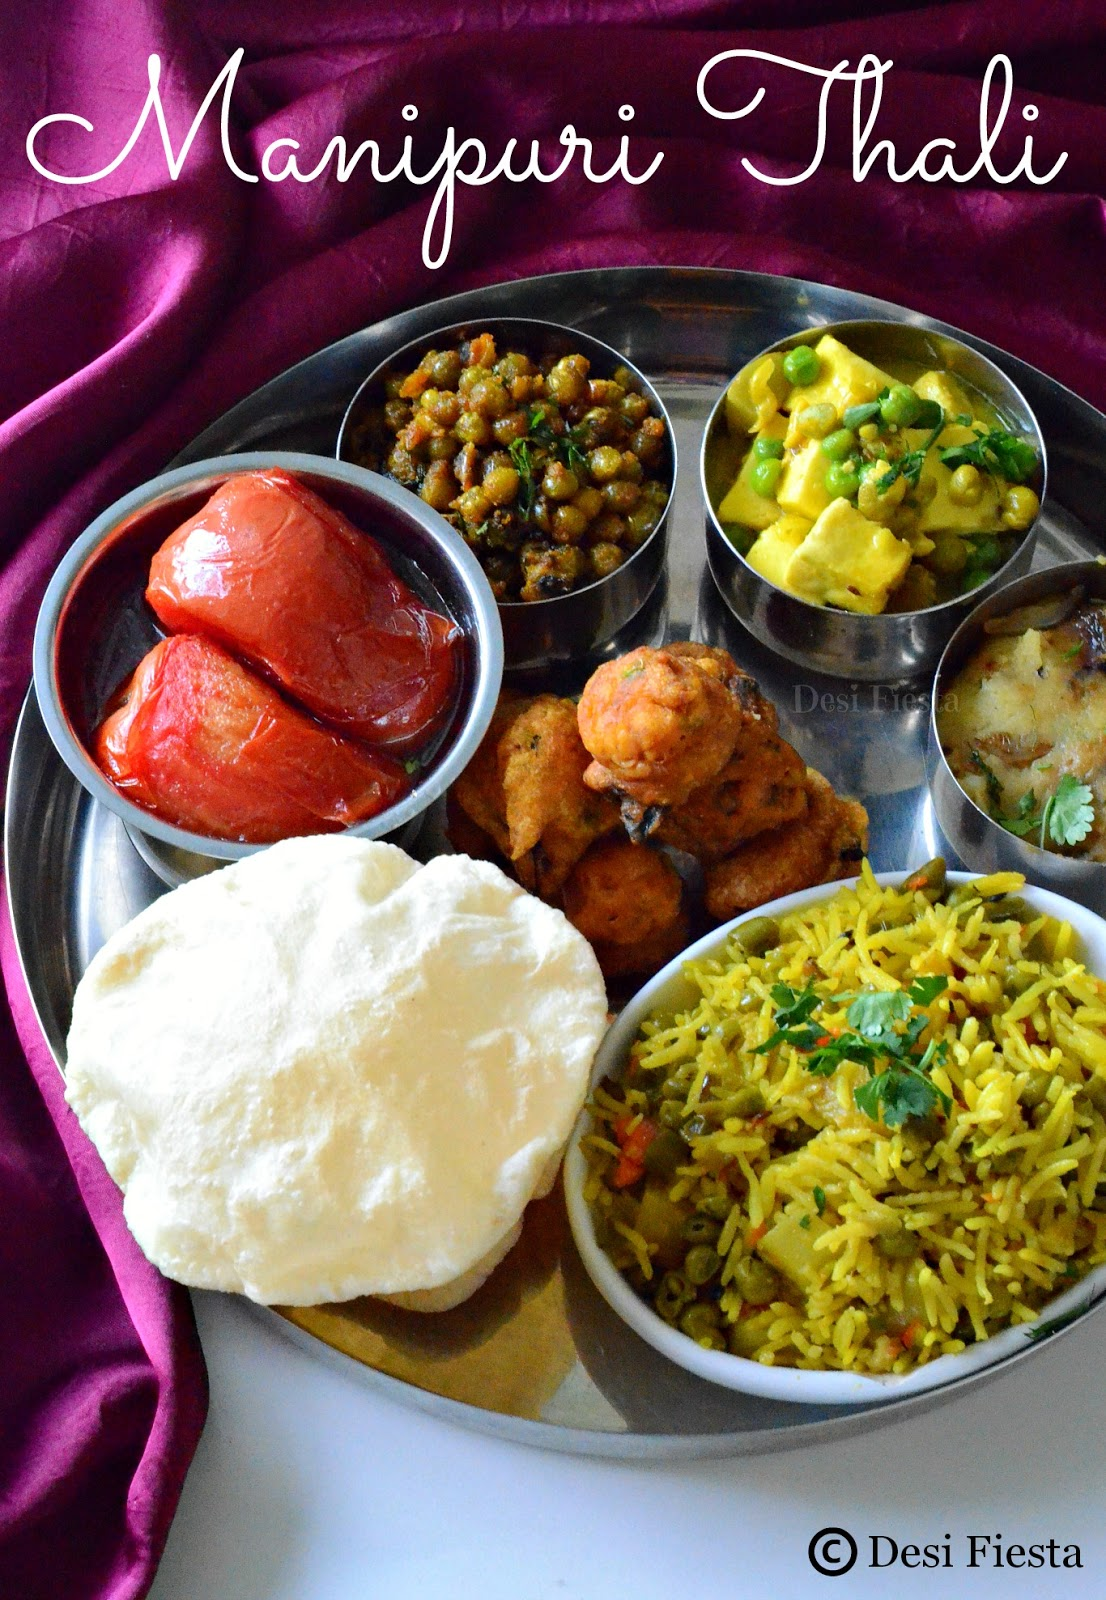 Manipuri thali manipur cuisine desi fiesta for Cuisine names